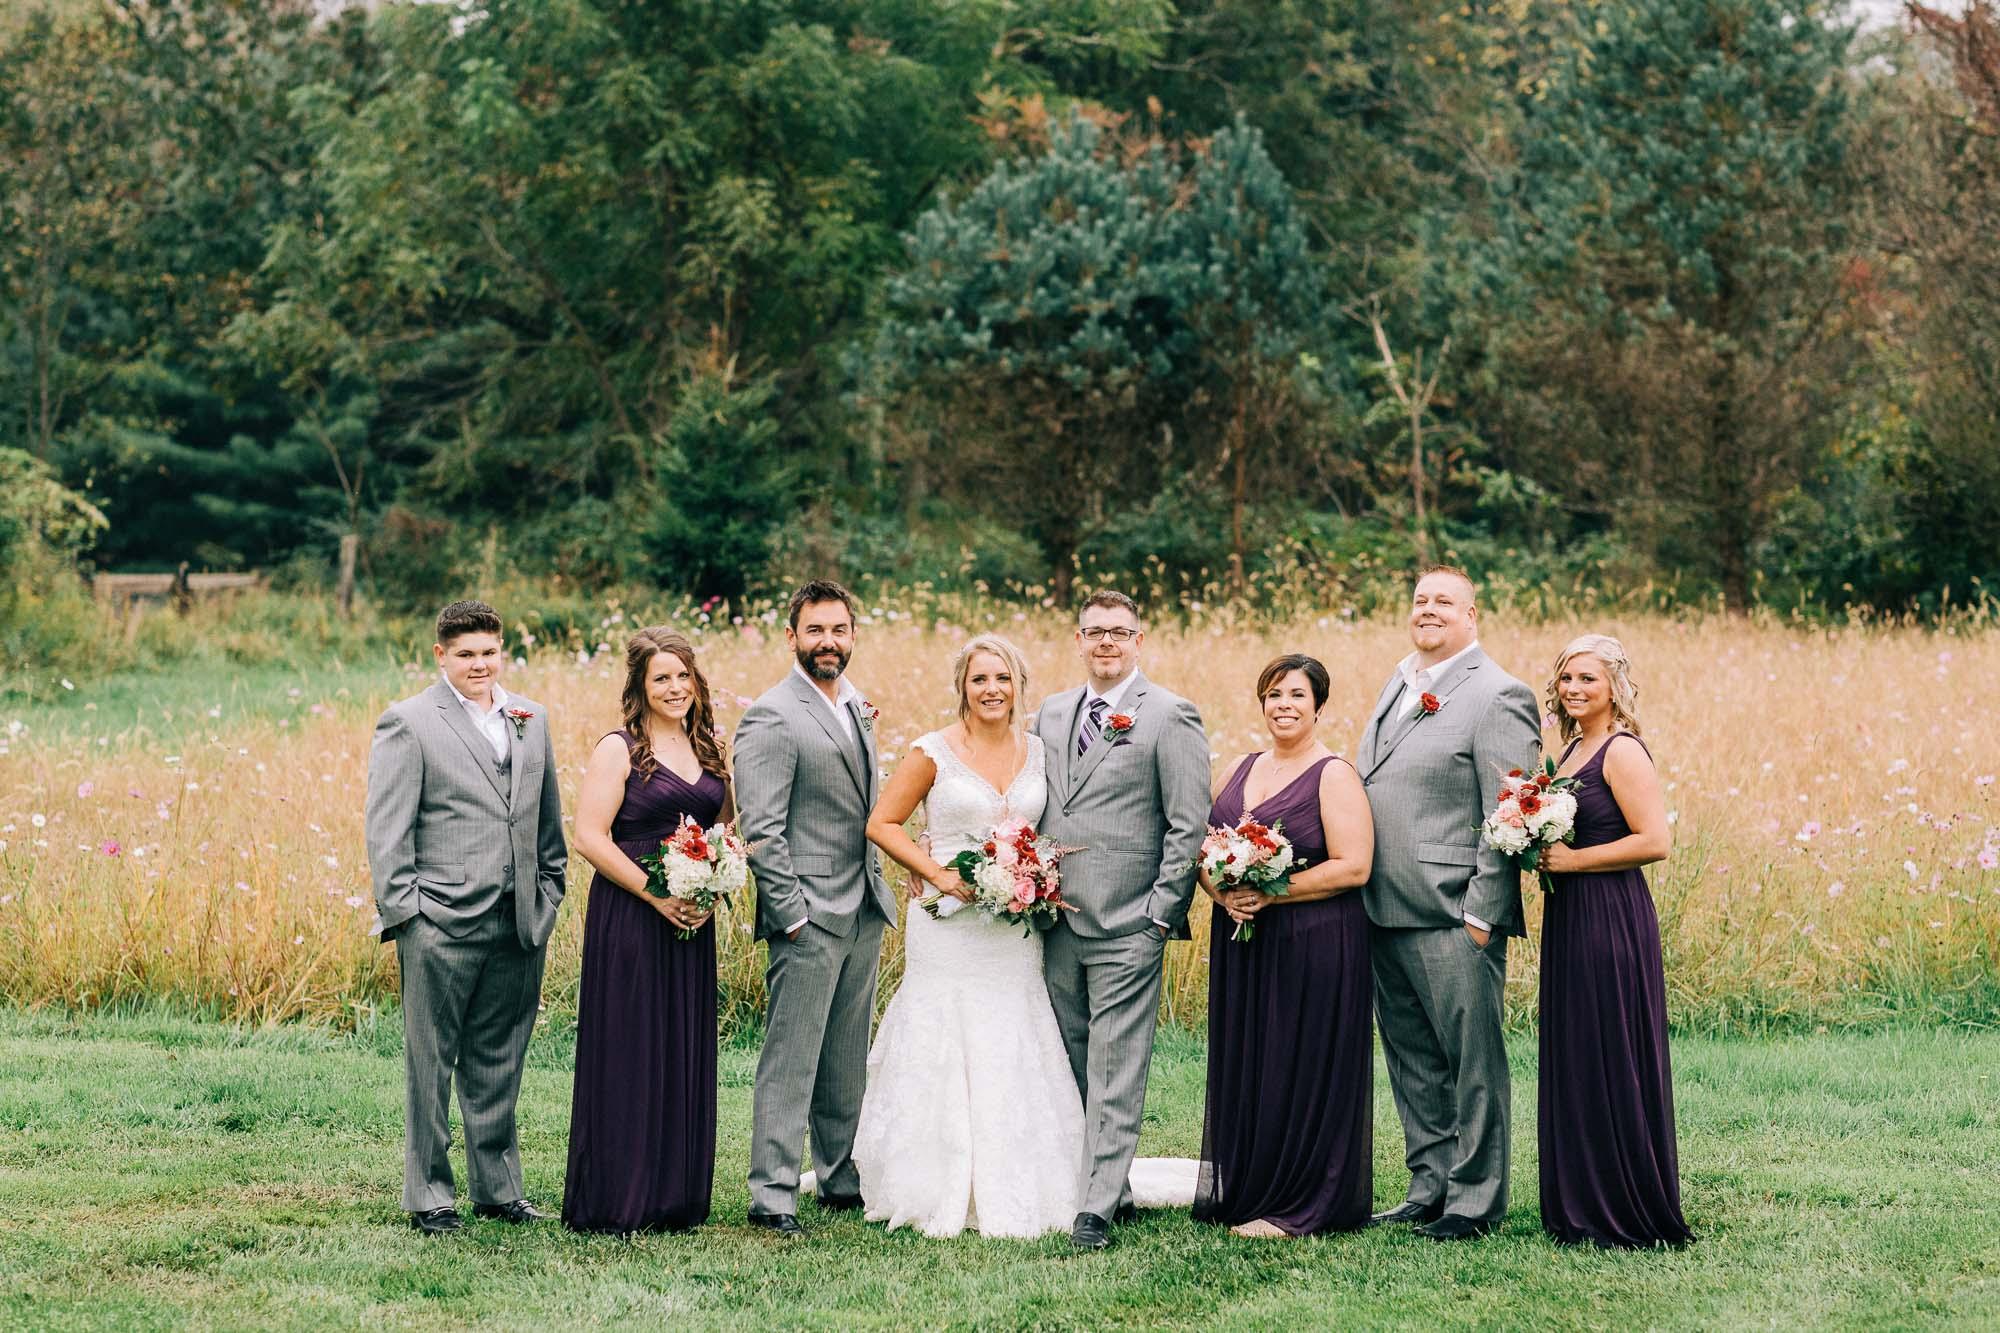 Lodge-at-Raven-Creek-October-wedding-43.jpg